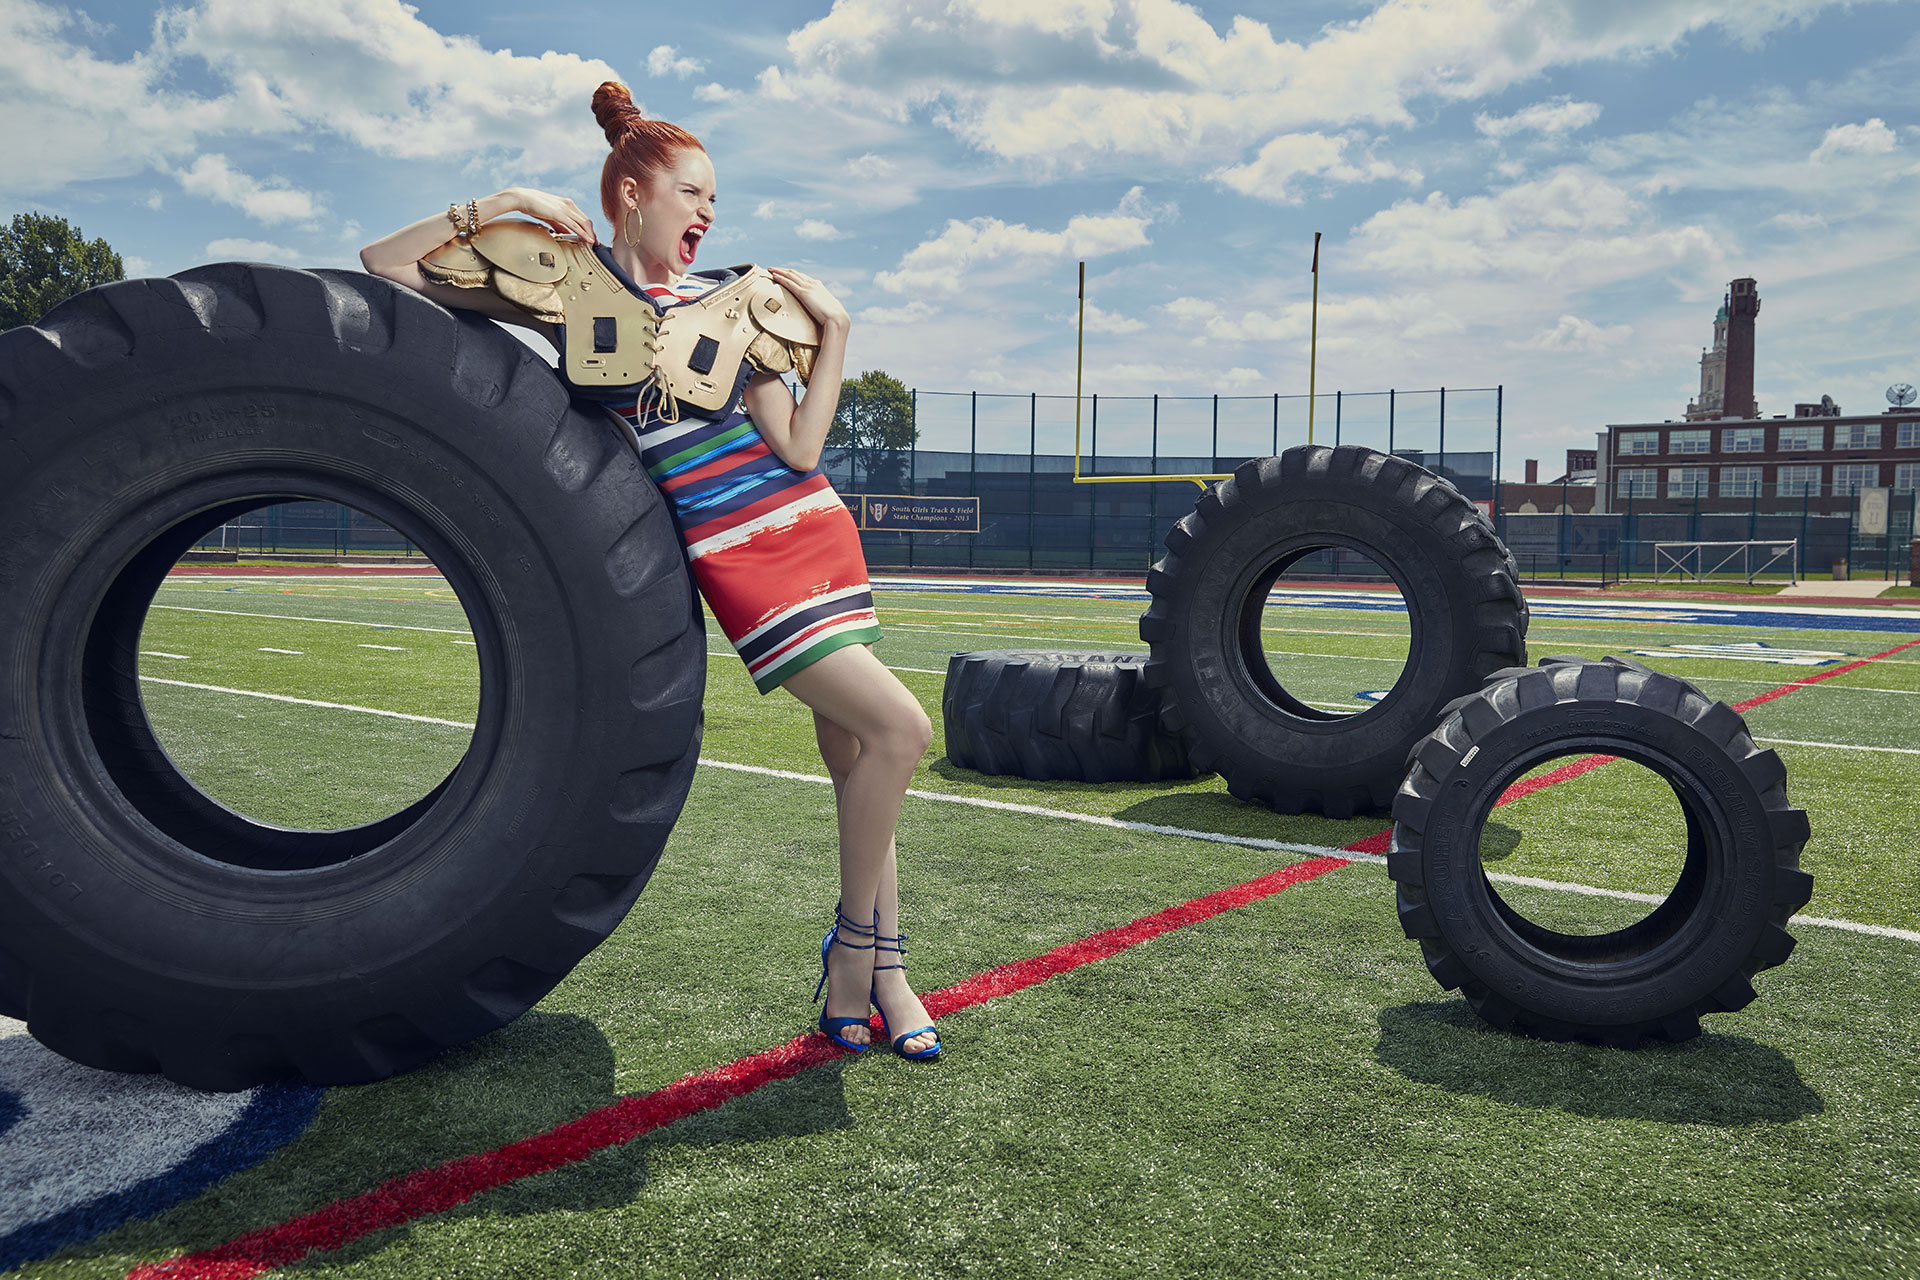 4_Tires_lians_jadan_fashion_editorial